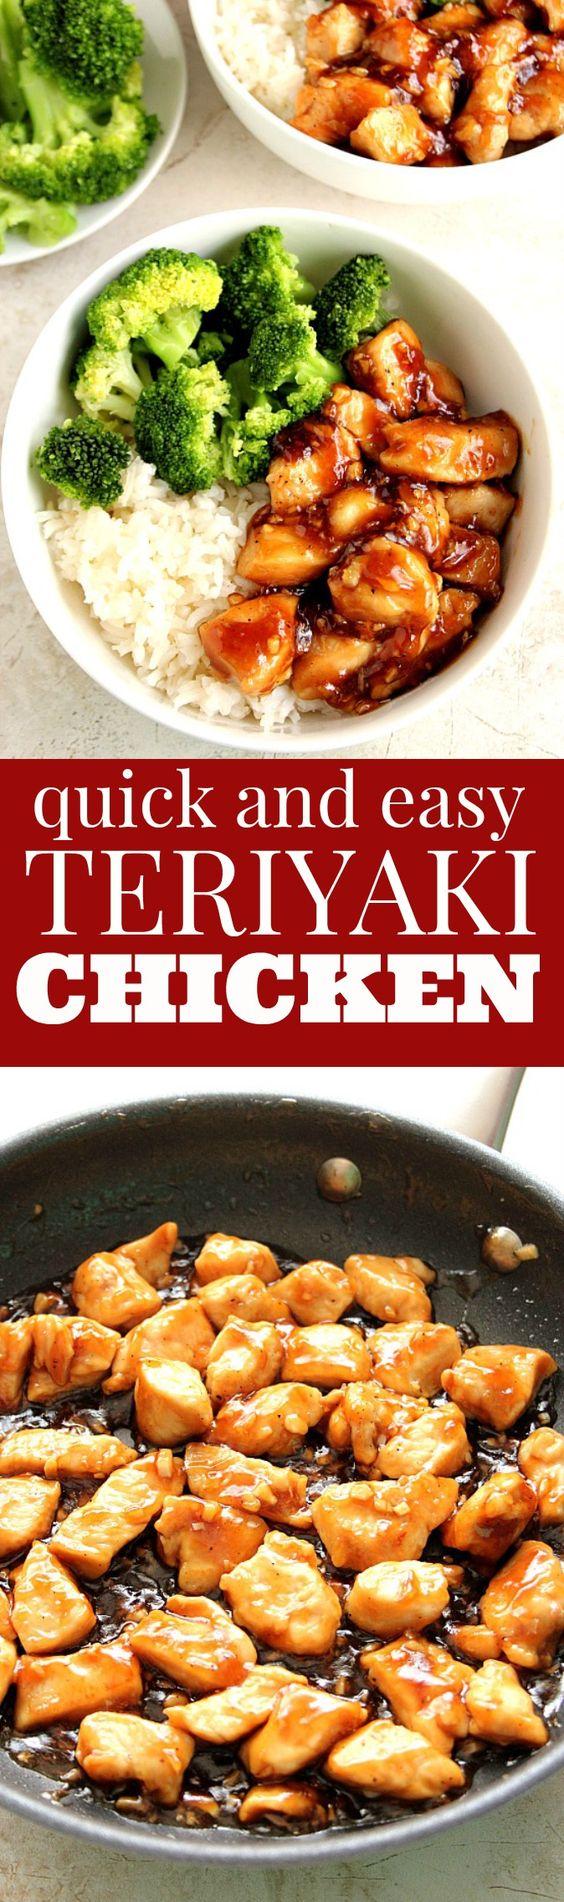 Quick Teriyaki Chicken Rice Bowls 1 Quick Teriyaki Chicken Rice Bowls